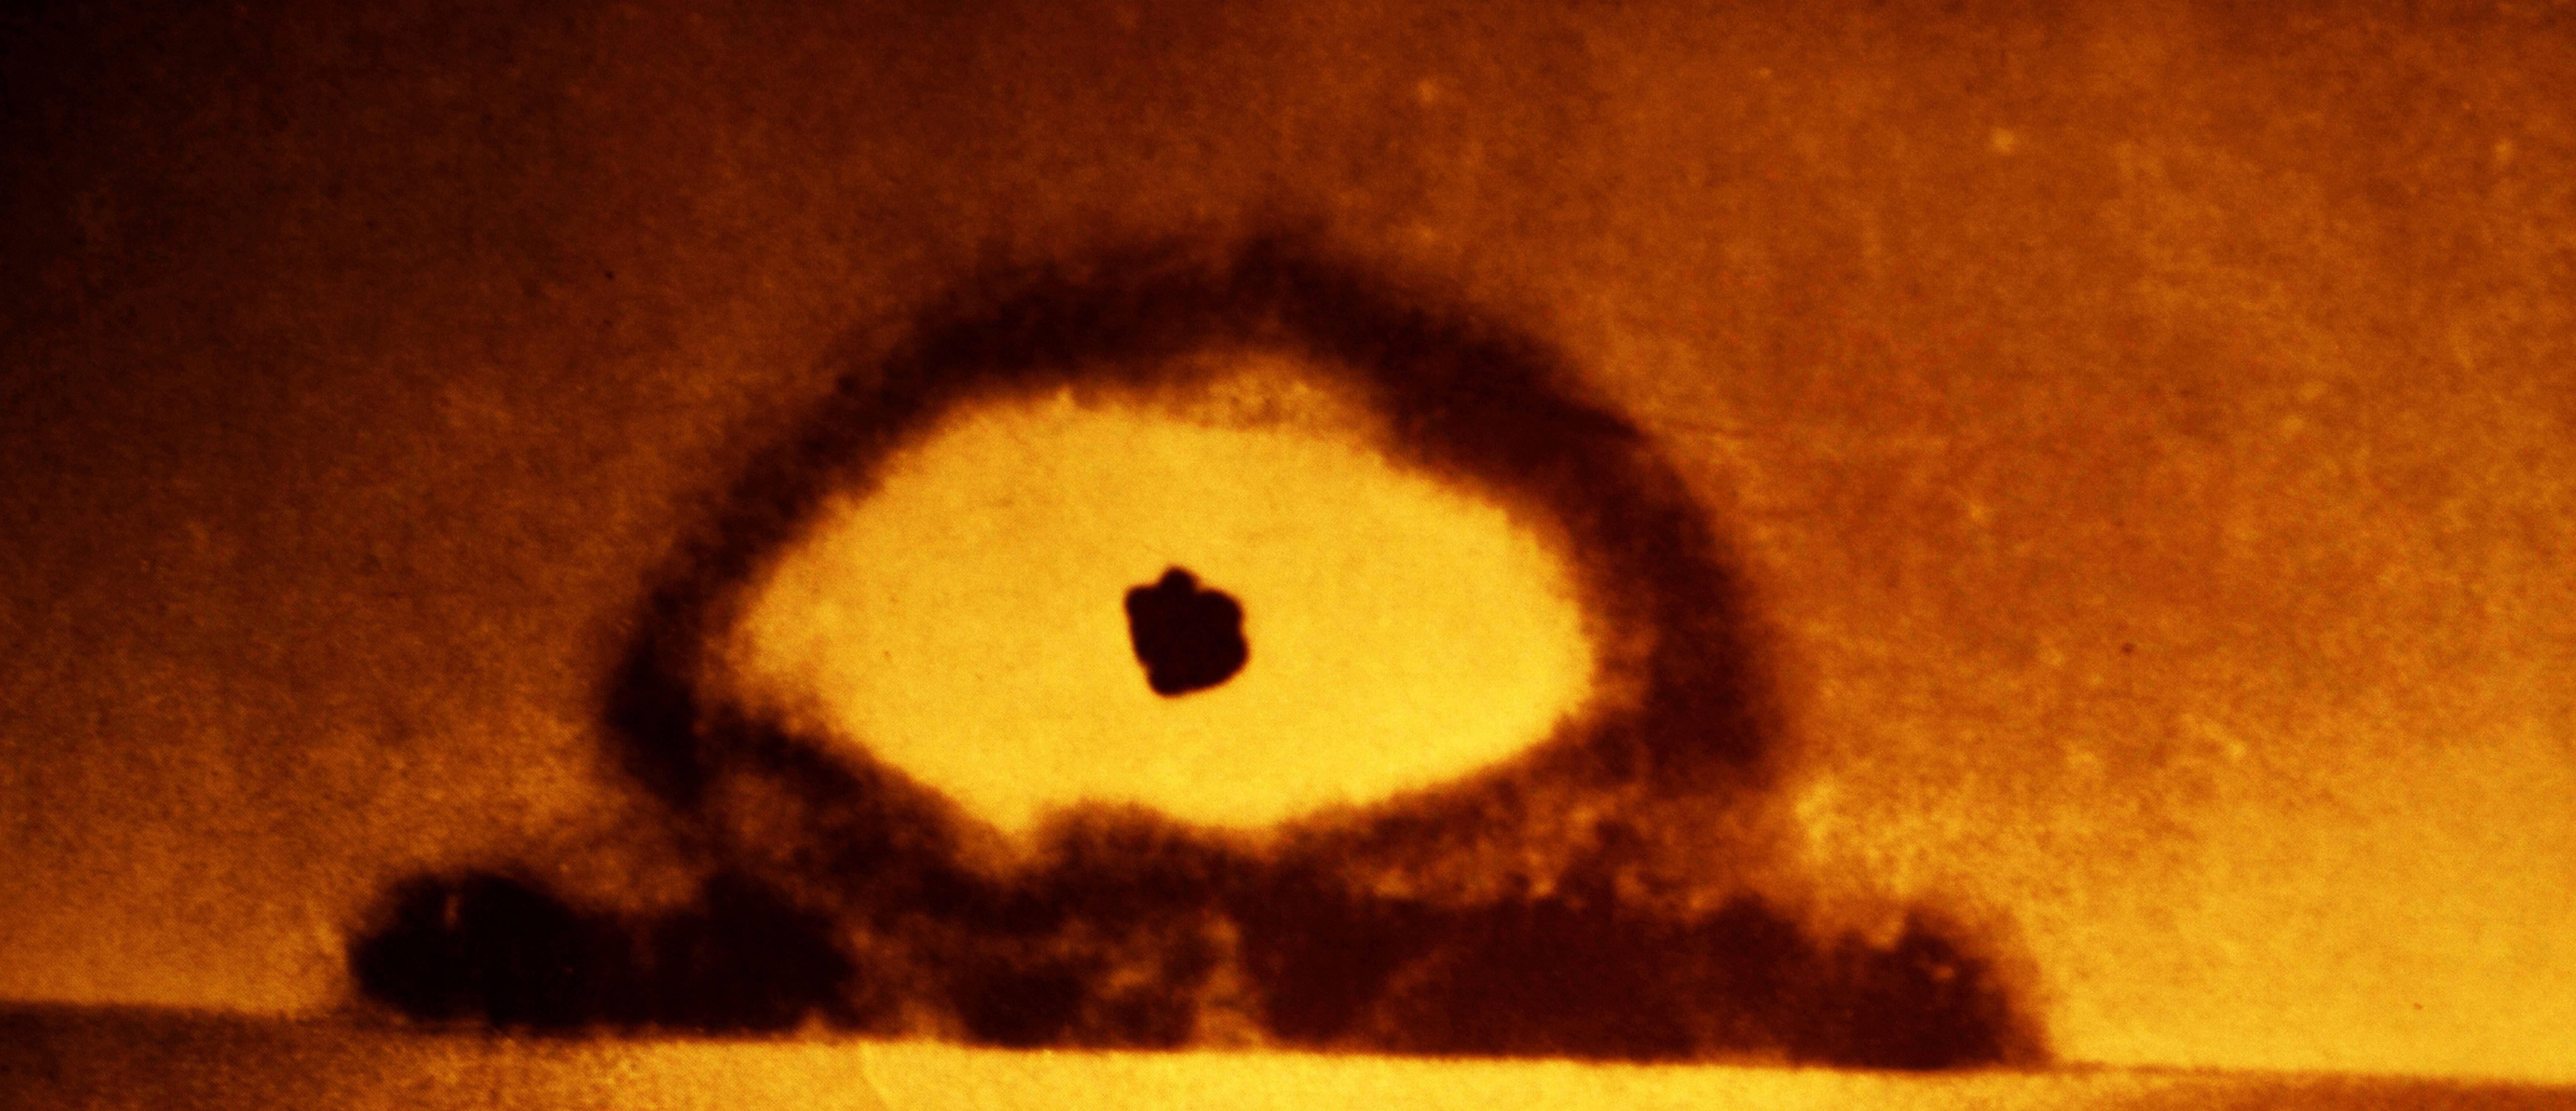 Trinity war eine Plutonium-Bombe.